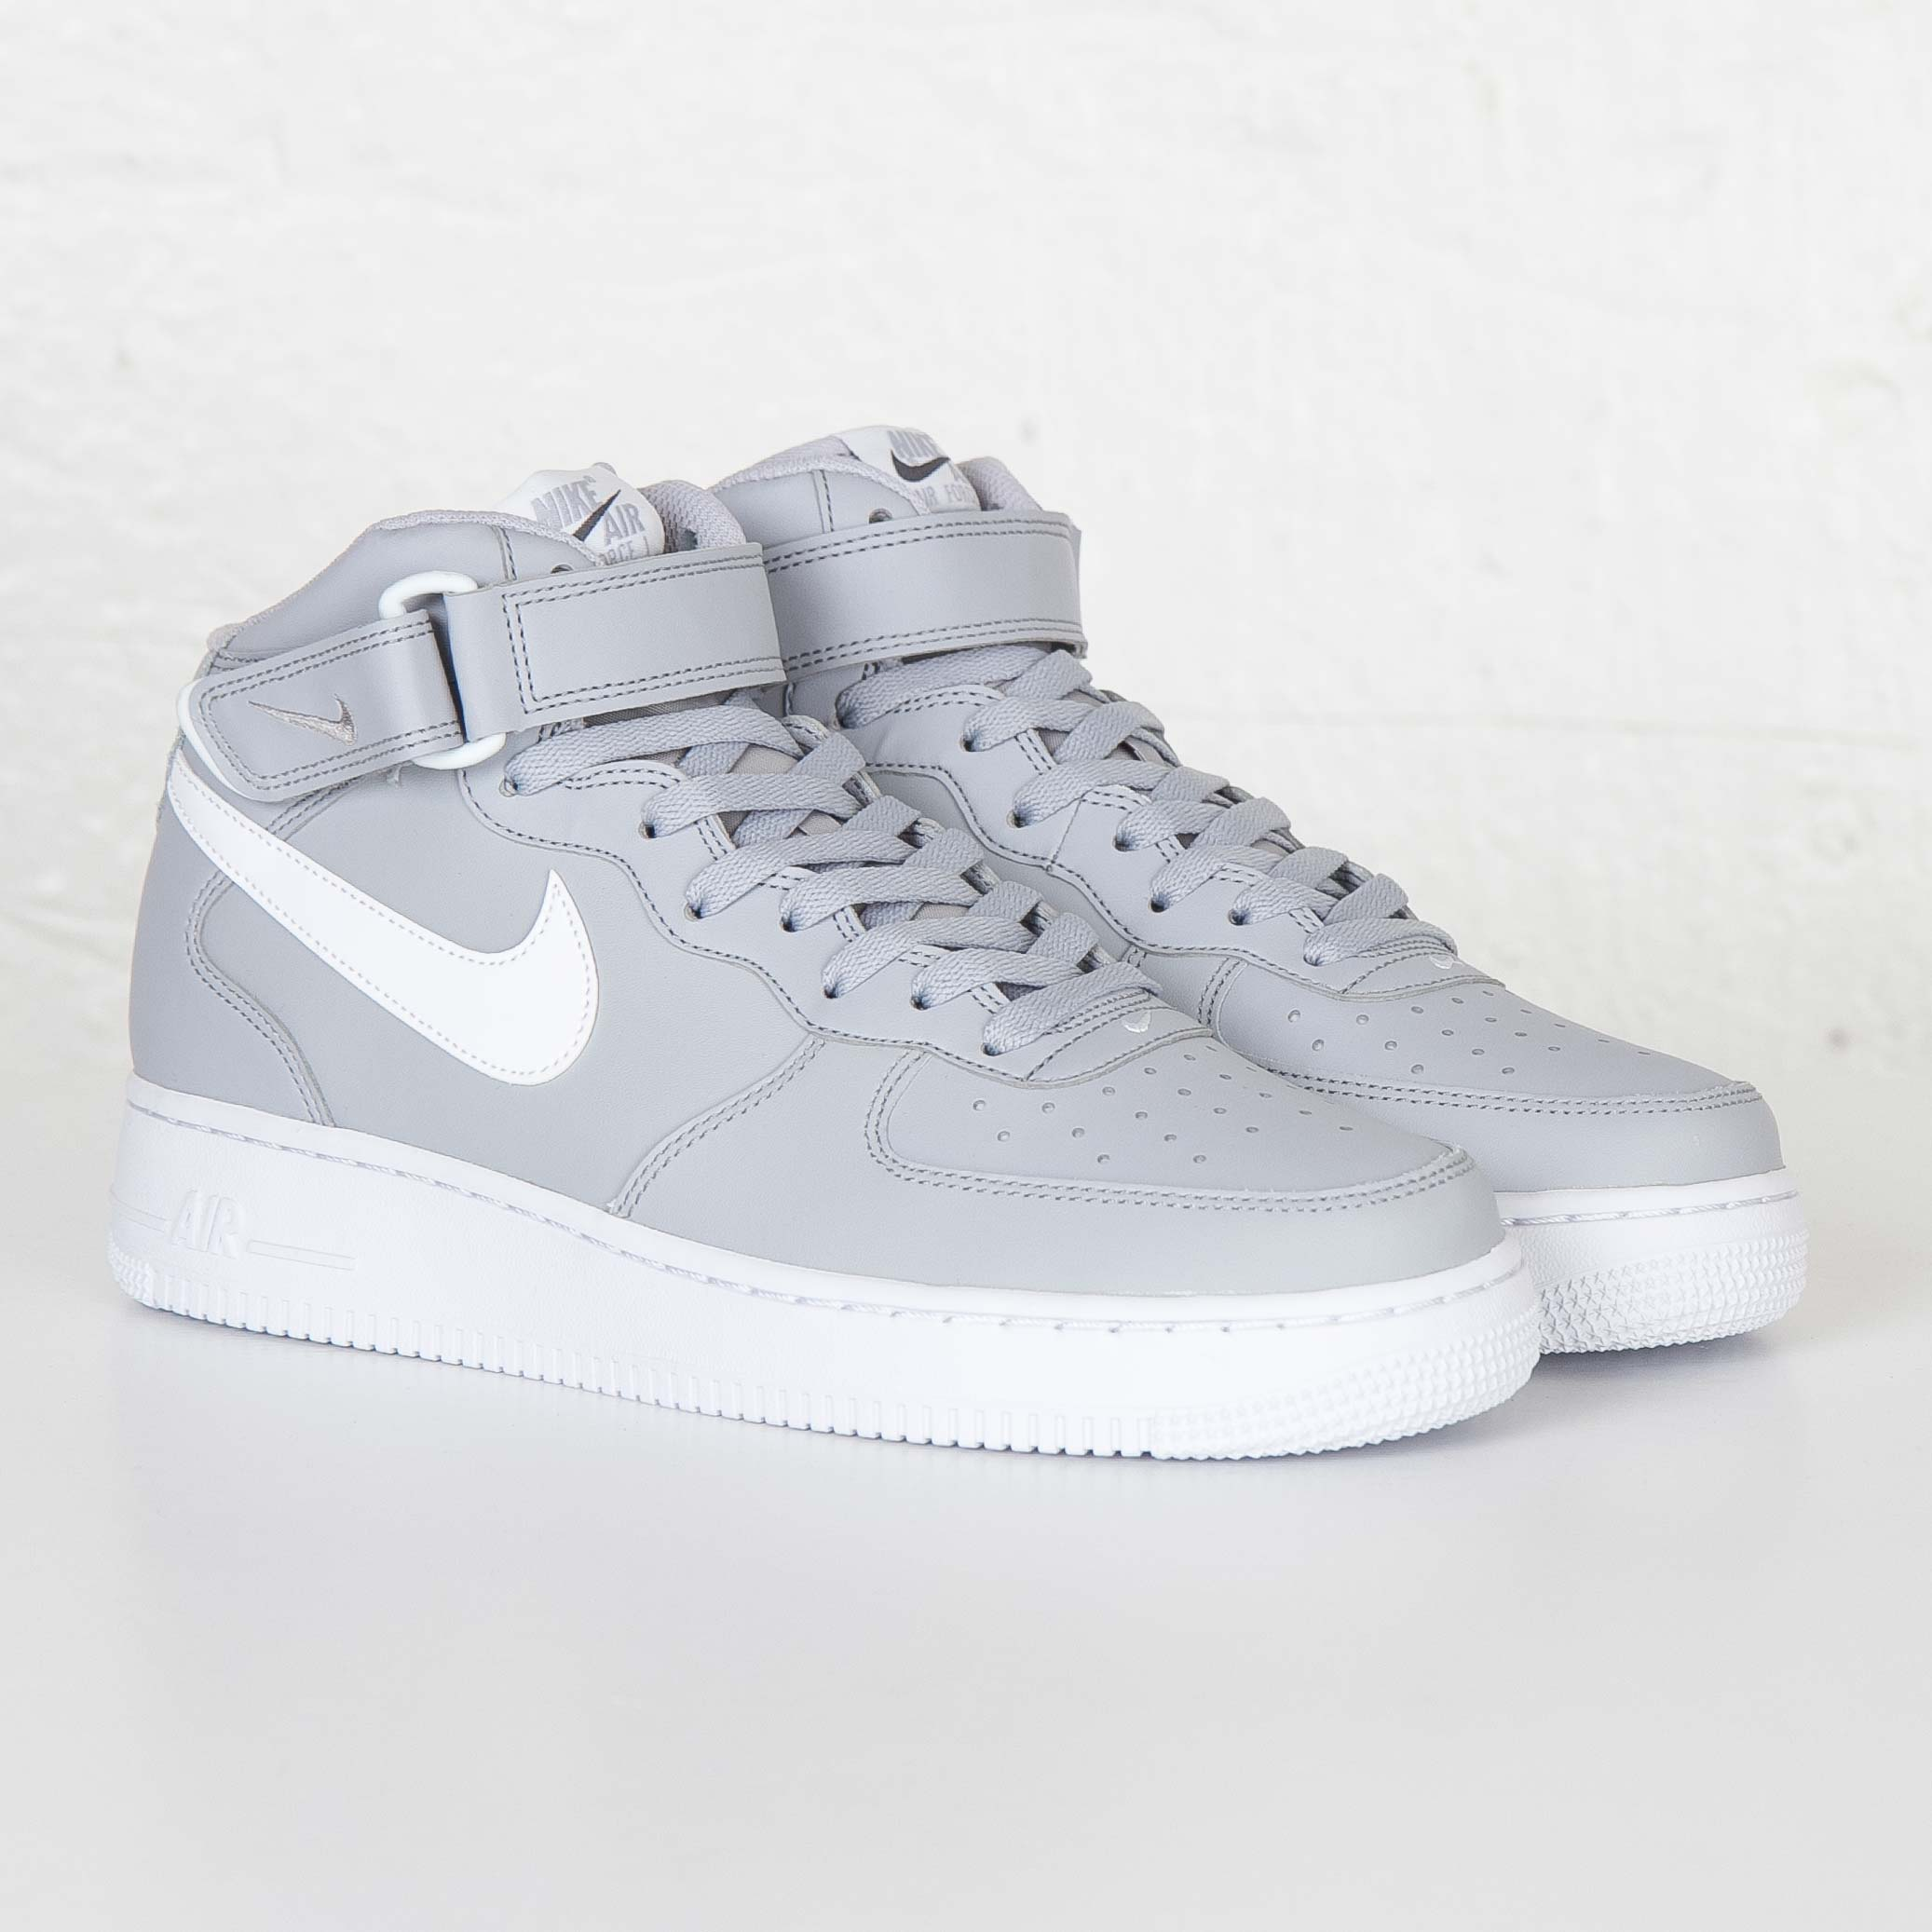 timeless design 0452e b49c0 Nike Air Force 1 Mid 07